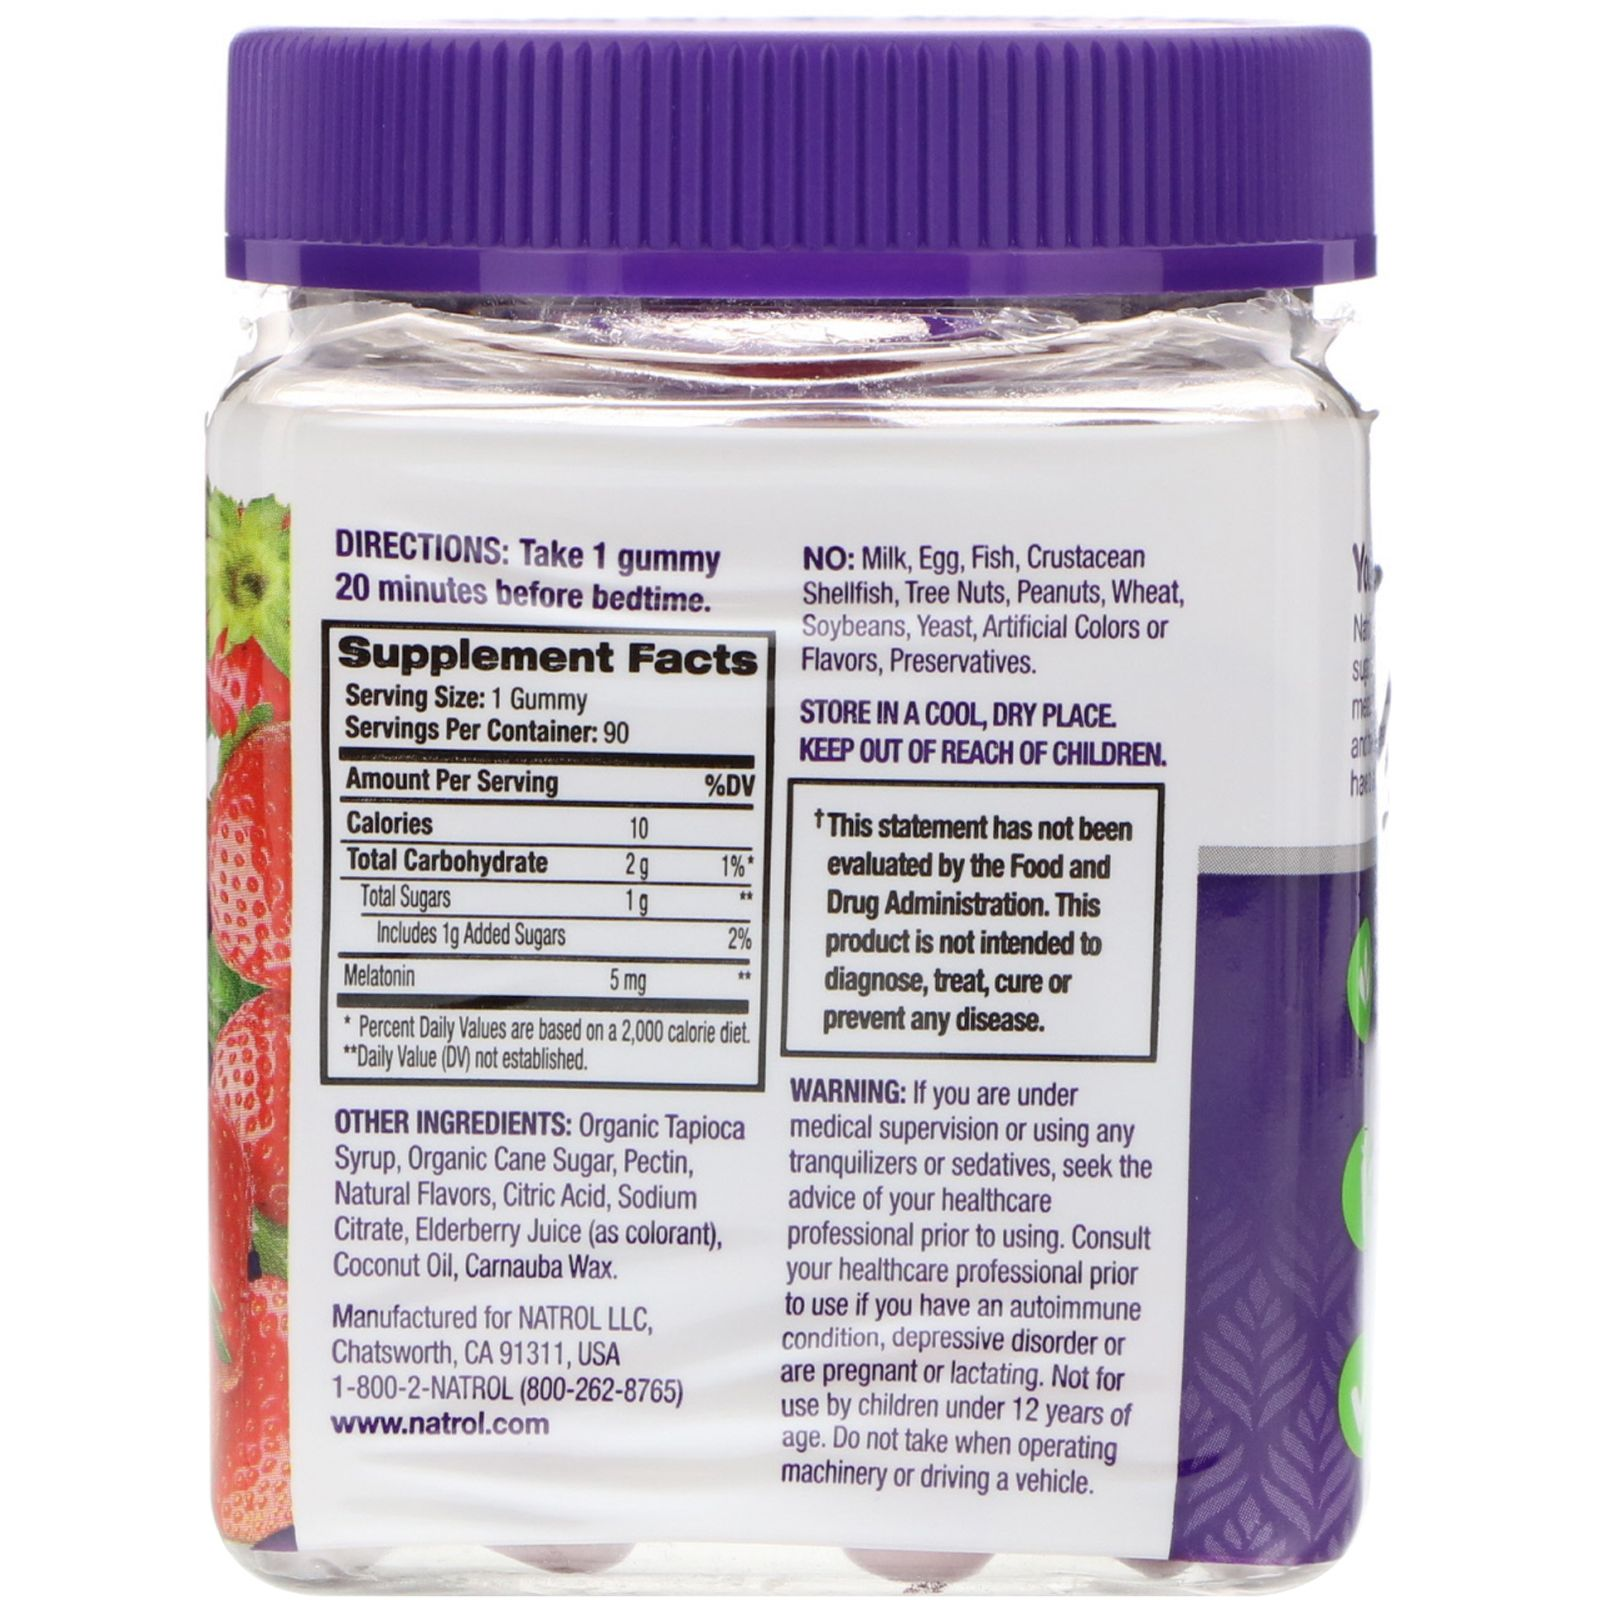 Kal Melatonin 3 Mg 120 Tablets: Comprar Natrol Melatonina 3 Mg 240 Comprimidos Procurando Onde